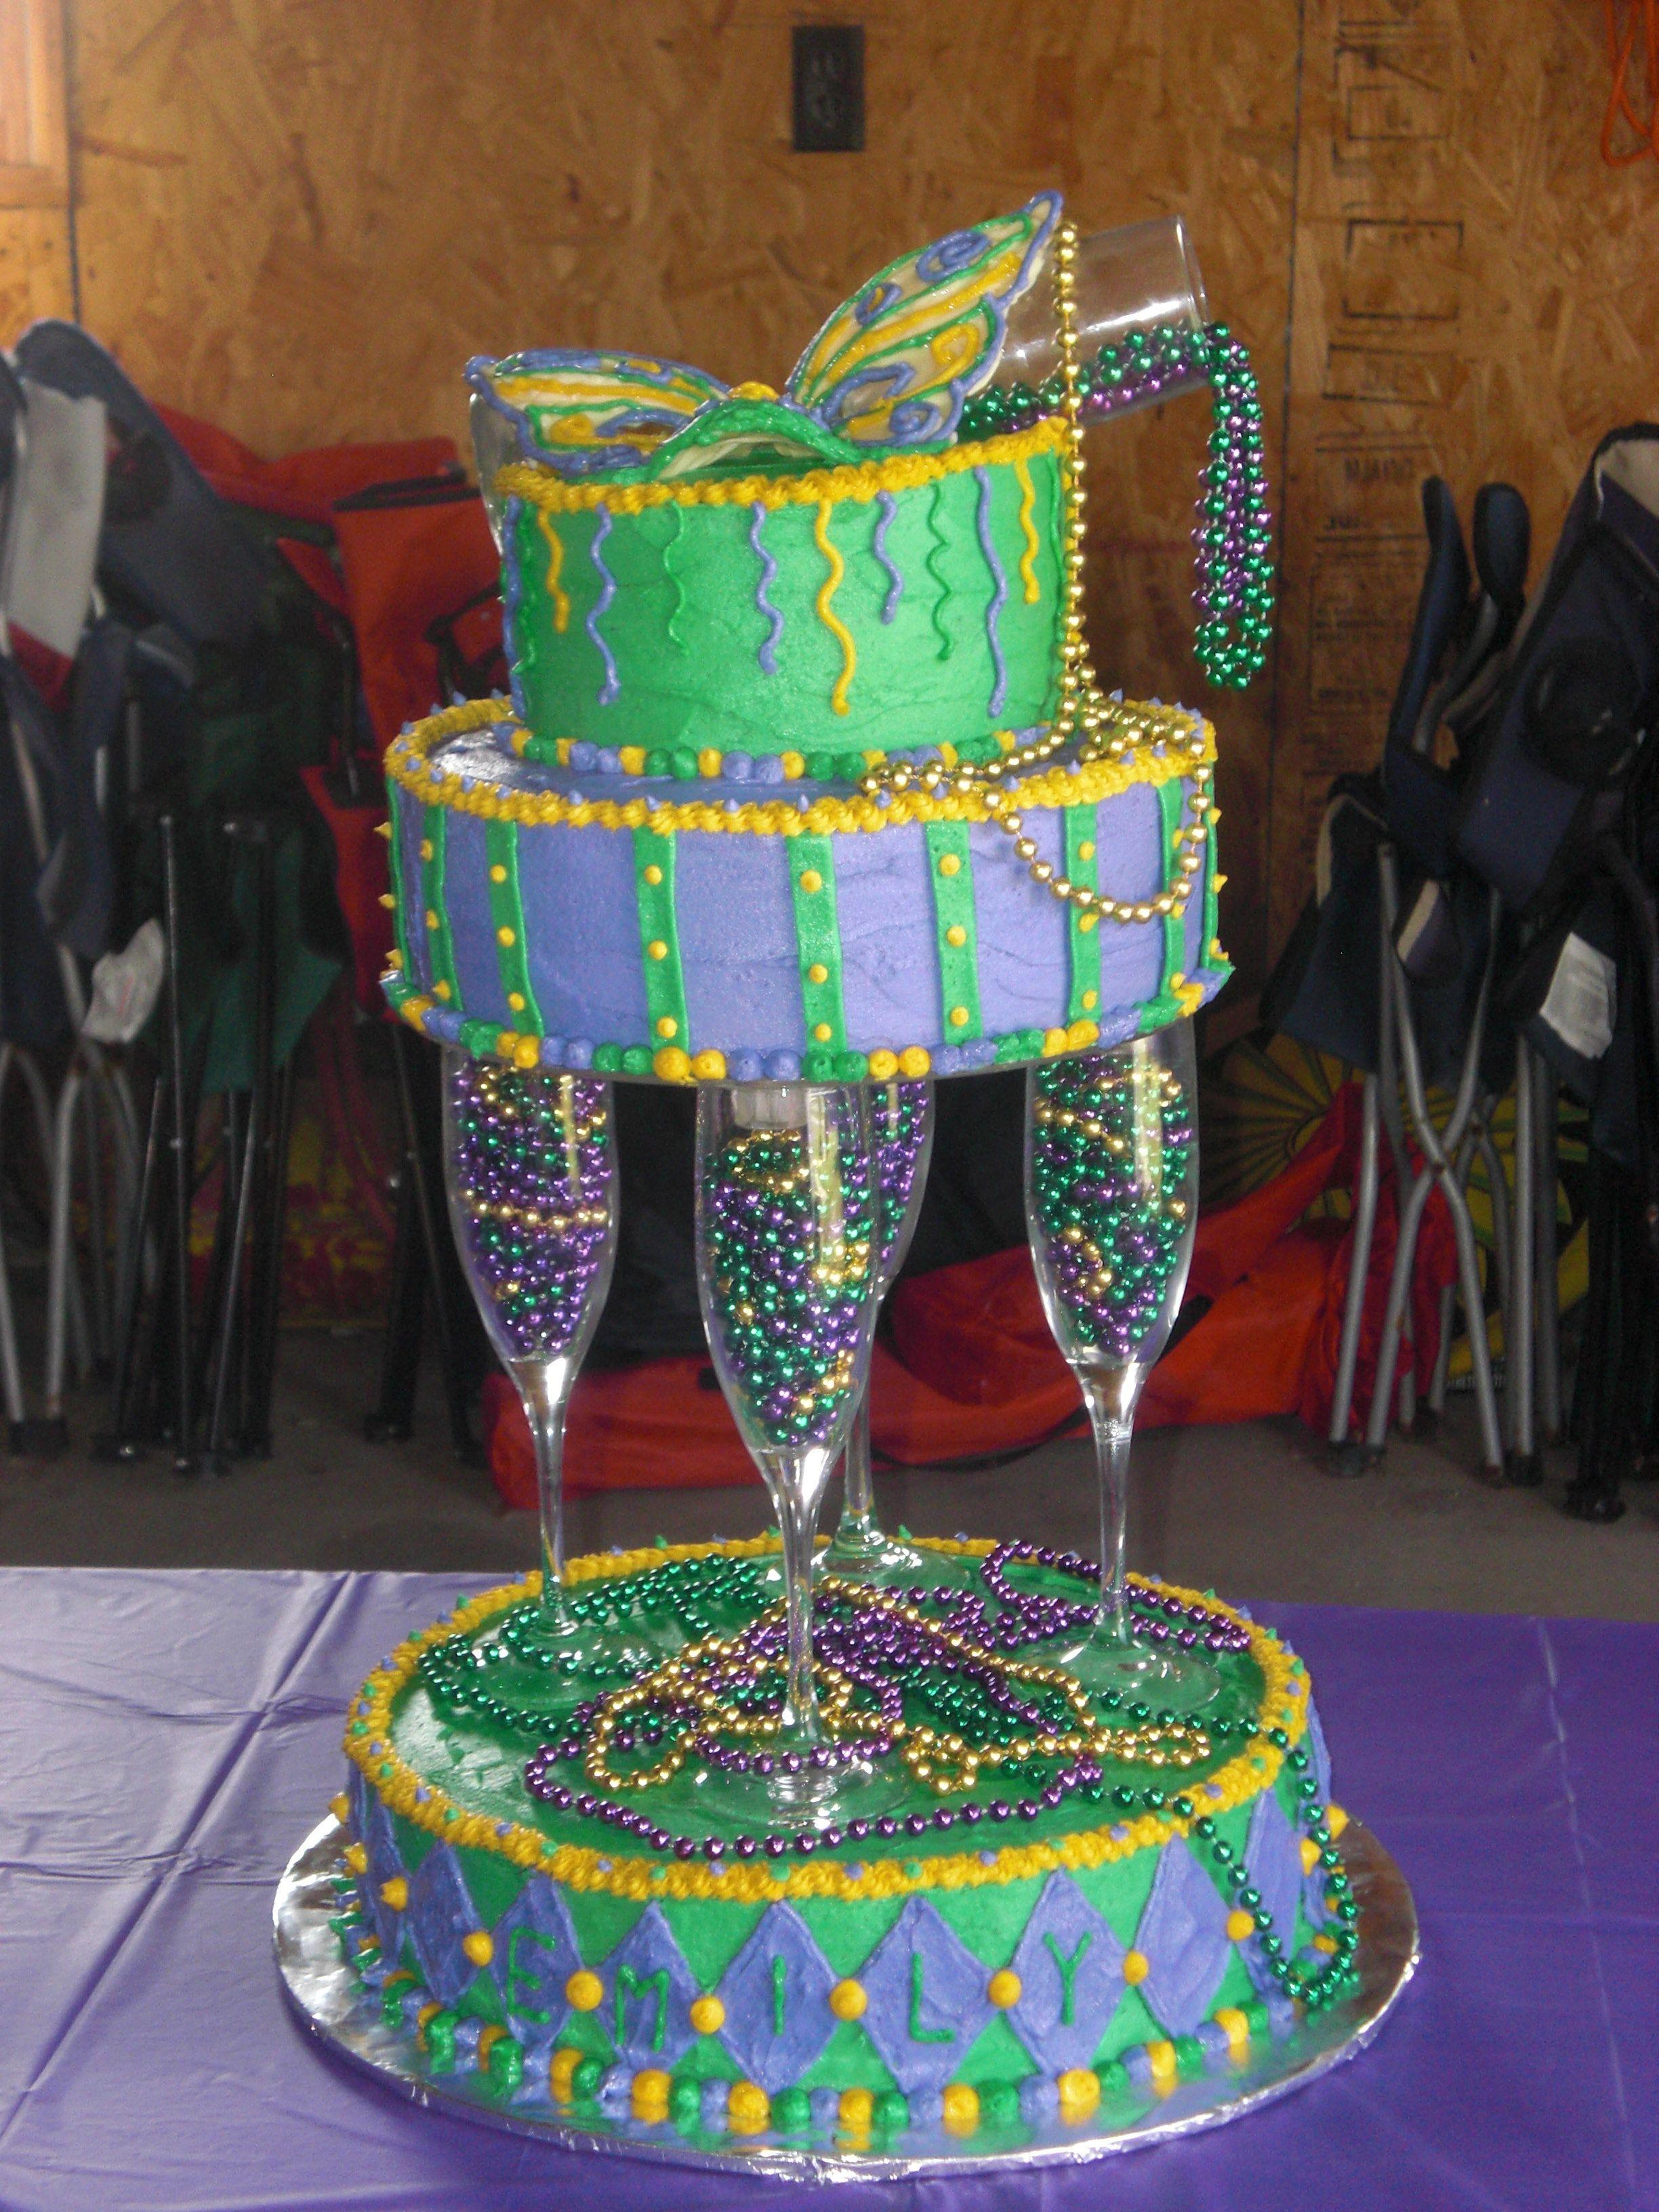 Mardi Gras Birthday Cake My Girlfriends Daughter Had A Mardi Gras